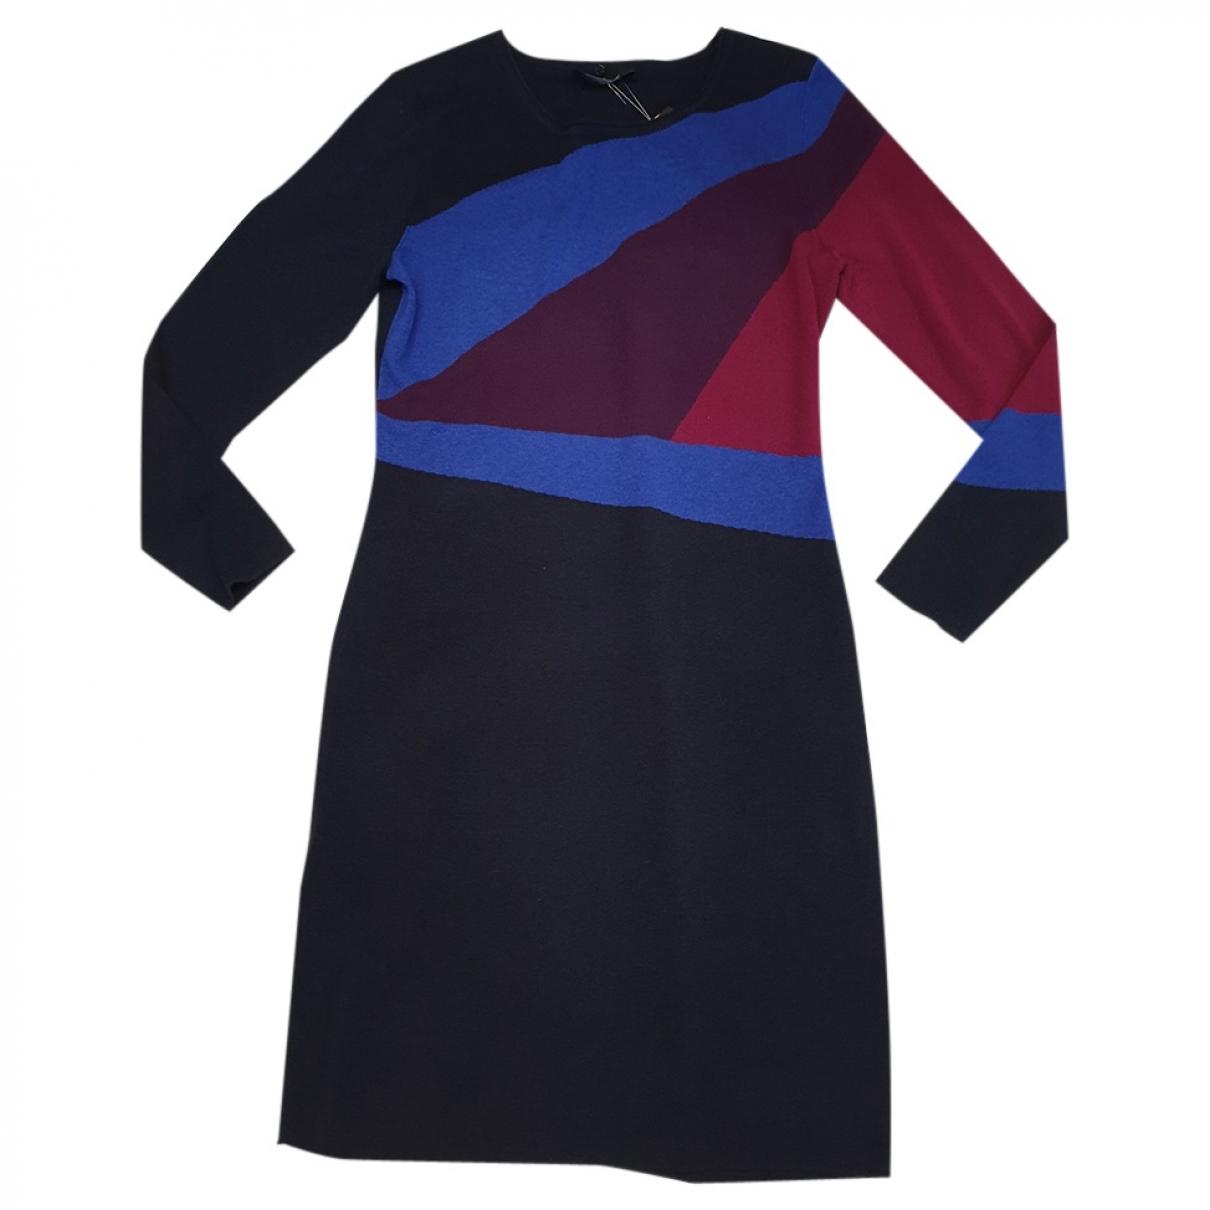 Elena Miro \N Kleid in  Schwarz Wolle